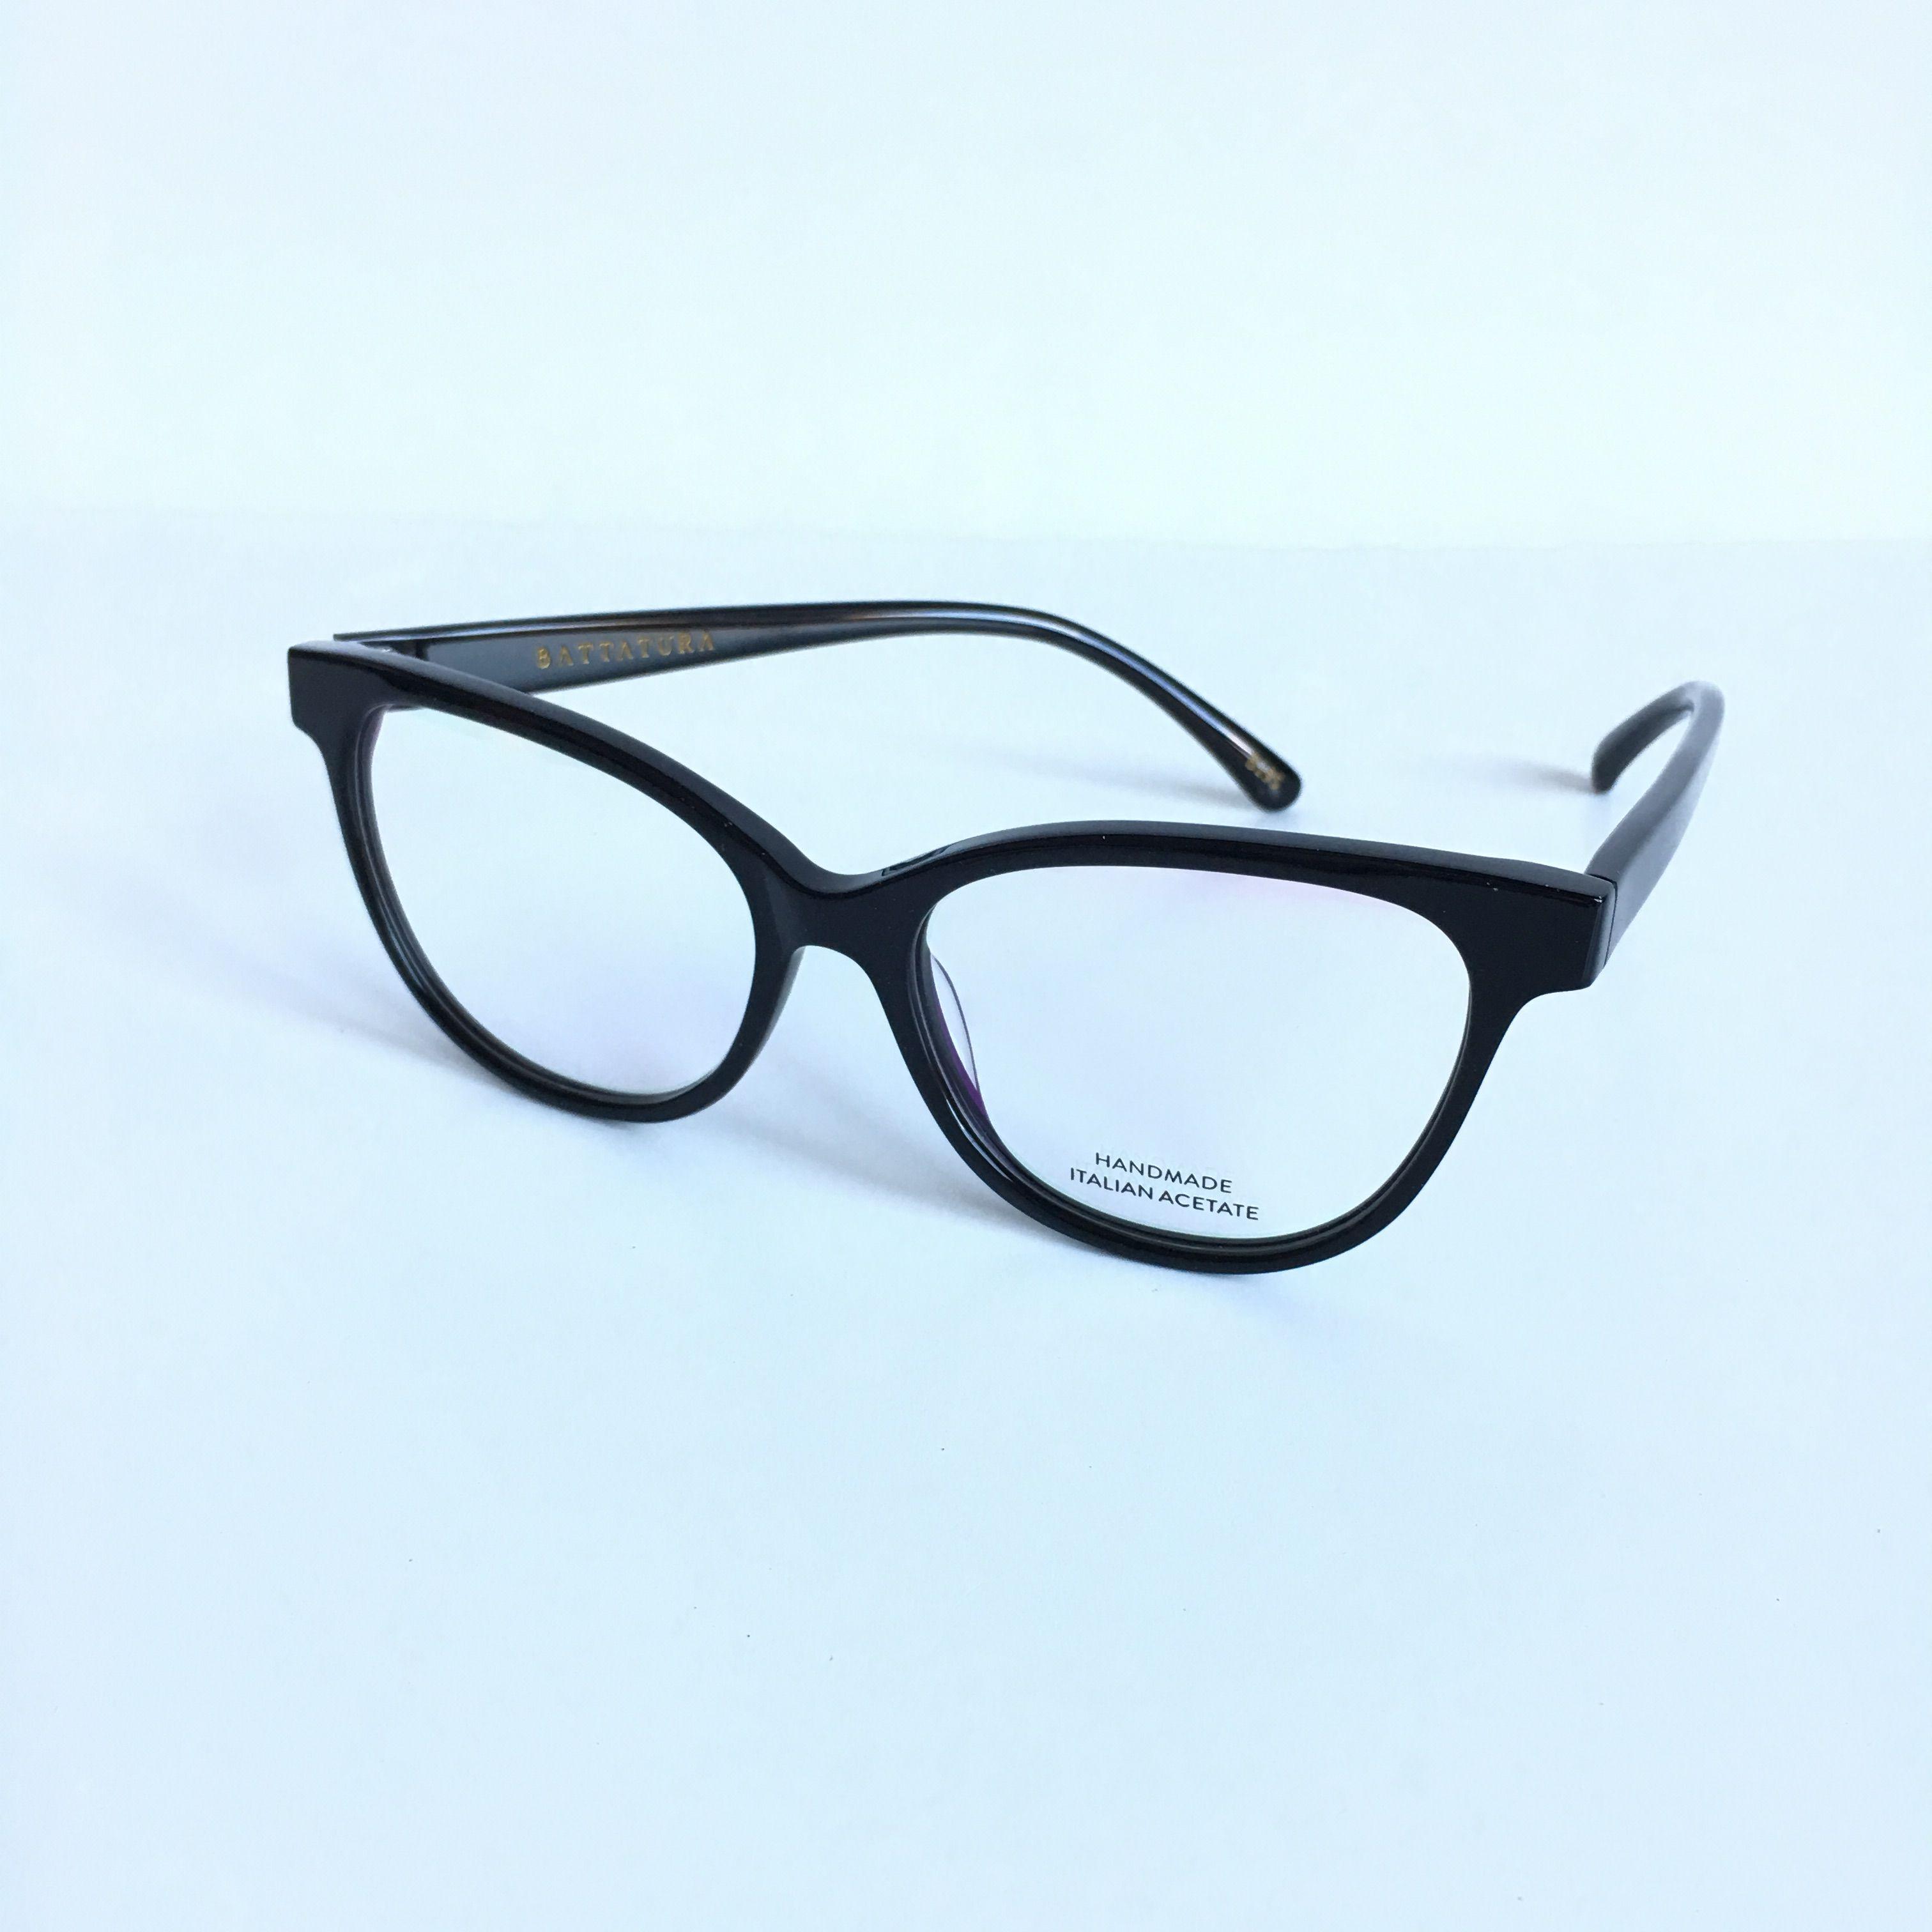 51ffa9d948eb9 EyeCatch - Italian Handmade Eyewear from €99 including prescription lenses  - Fashion glasses at budget